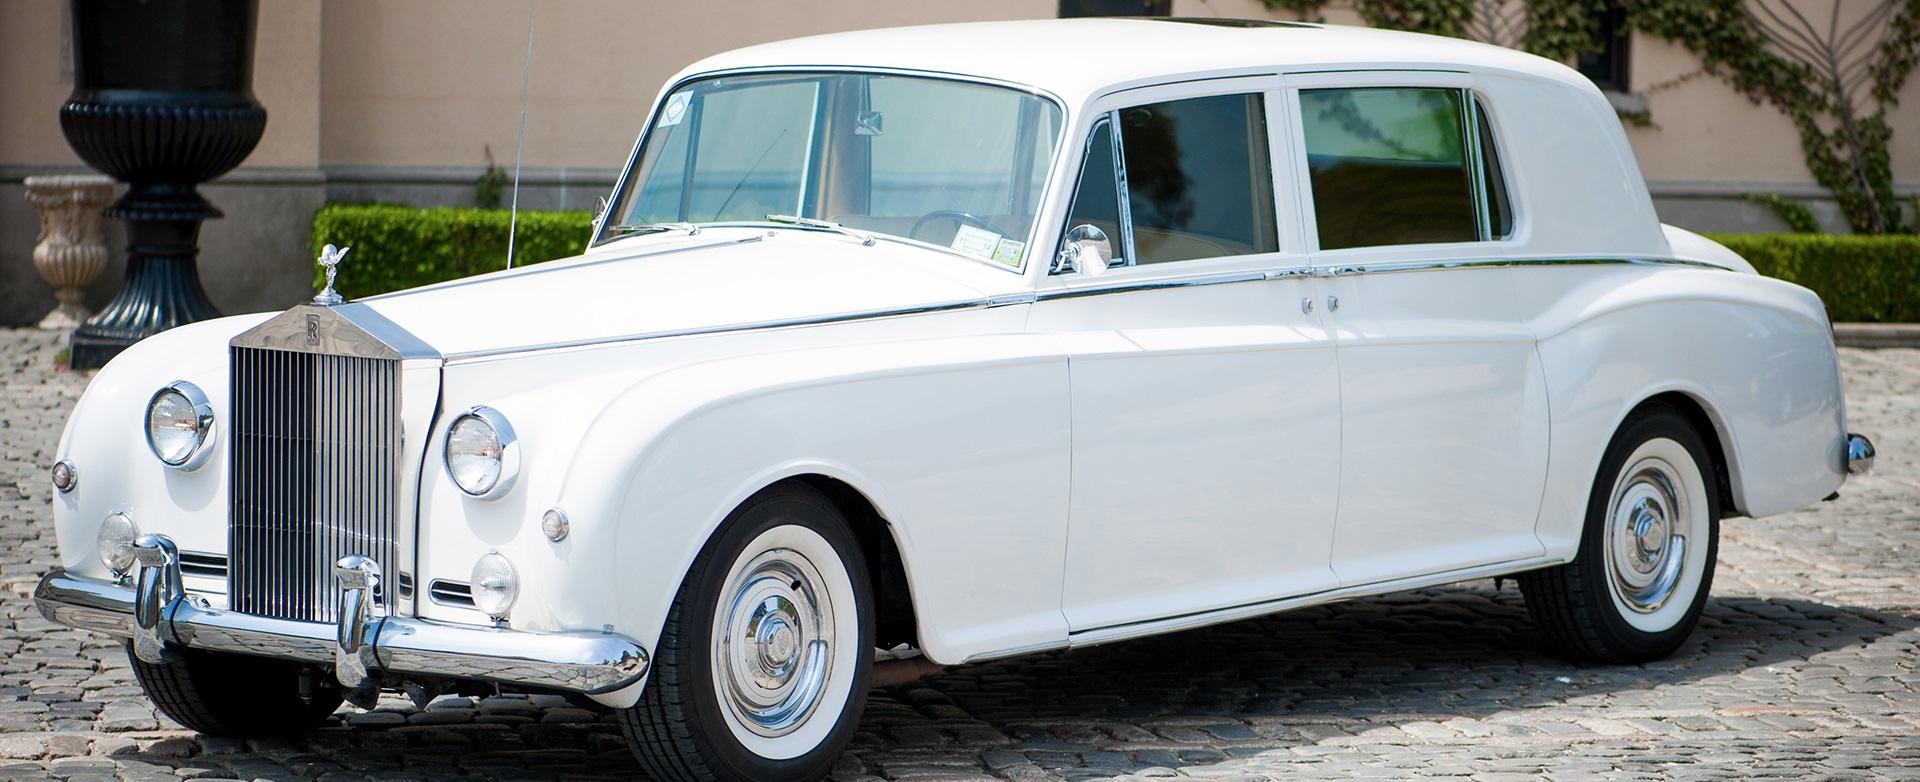 1962 vintage rolls royce | james young edition phantom vall star